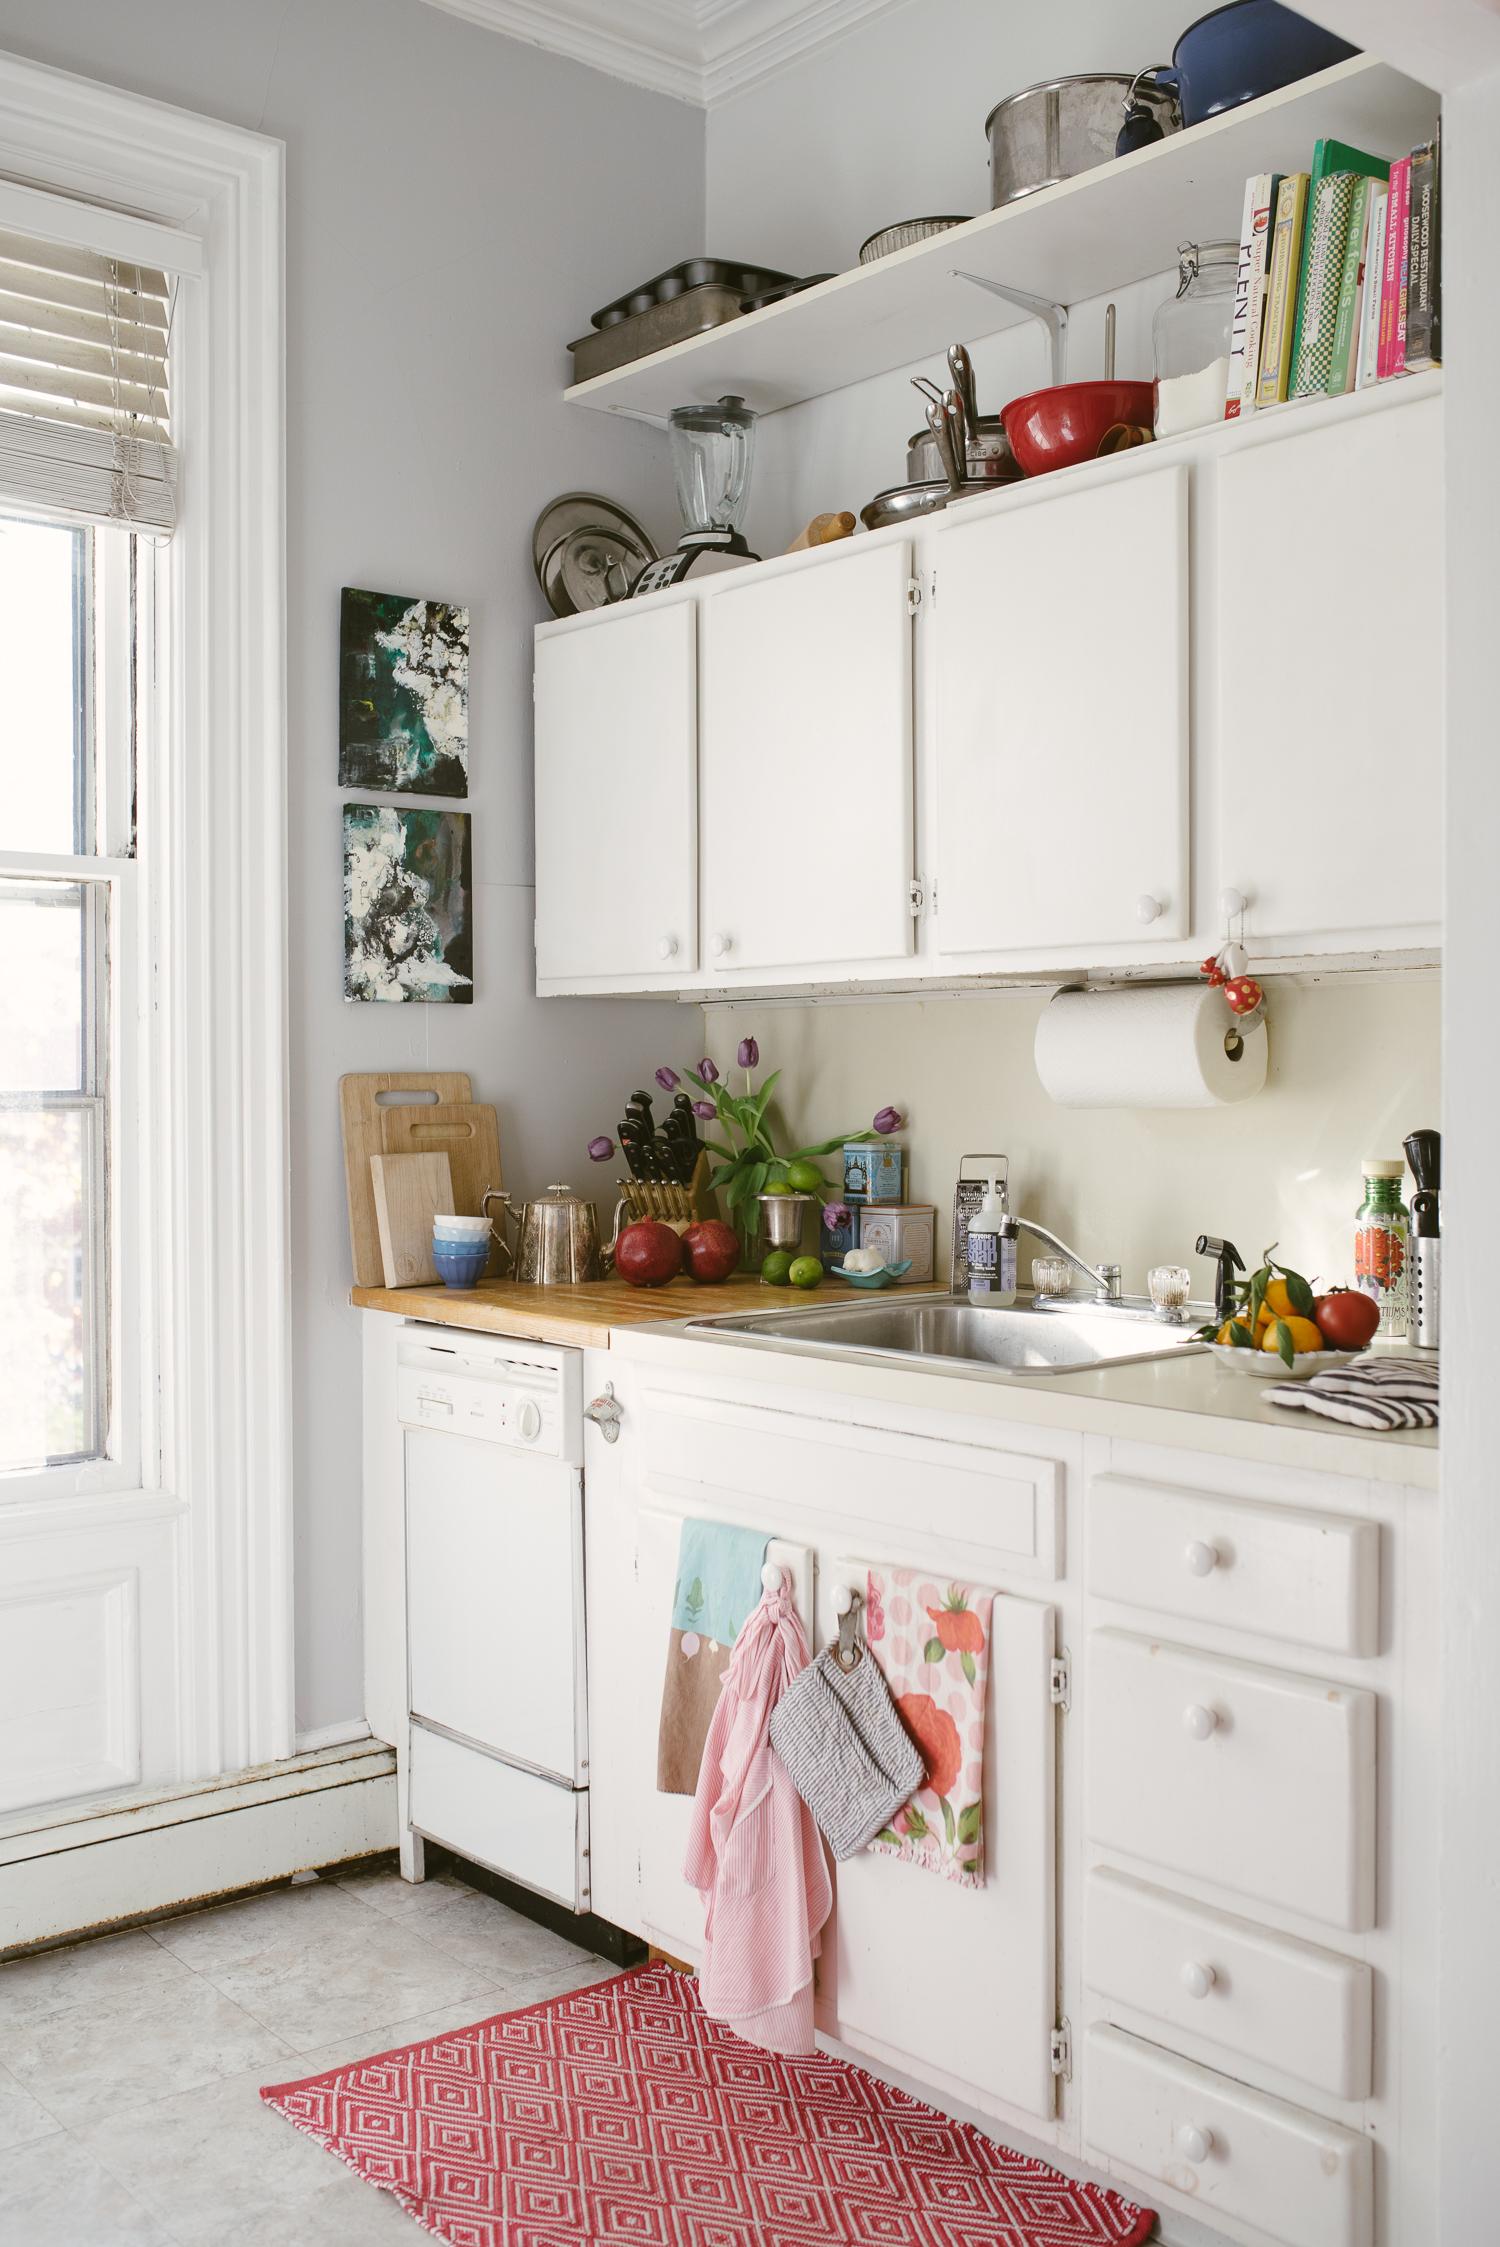 kelly_knapp_kitchen_01.jpg